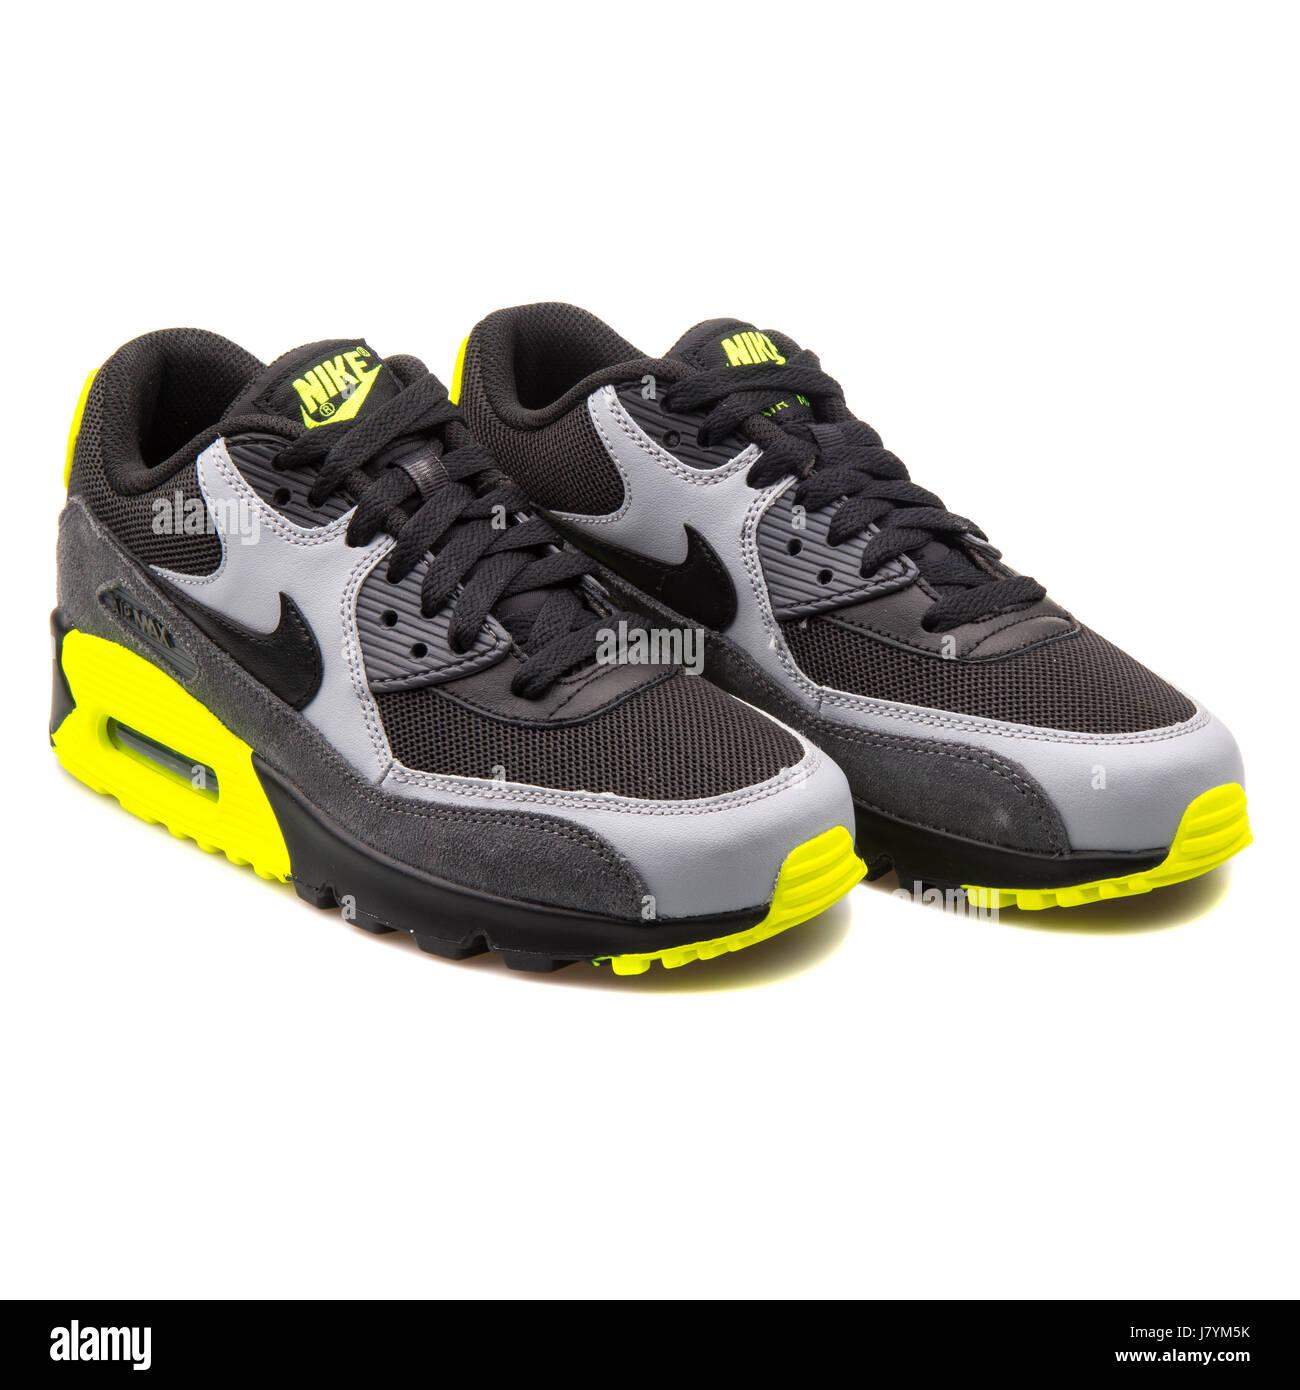 new concept 09094 12bf3 Nike Air Max 90 Mesh (GS) Jugend schwarz grau und gelb Leder-Sneakers